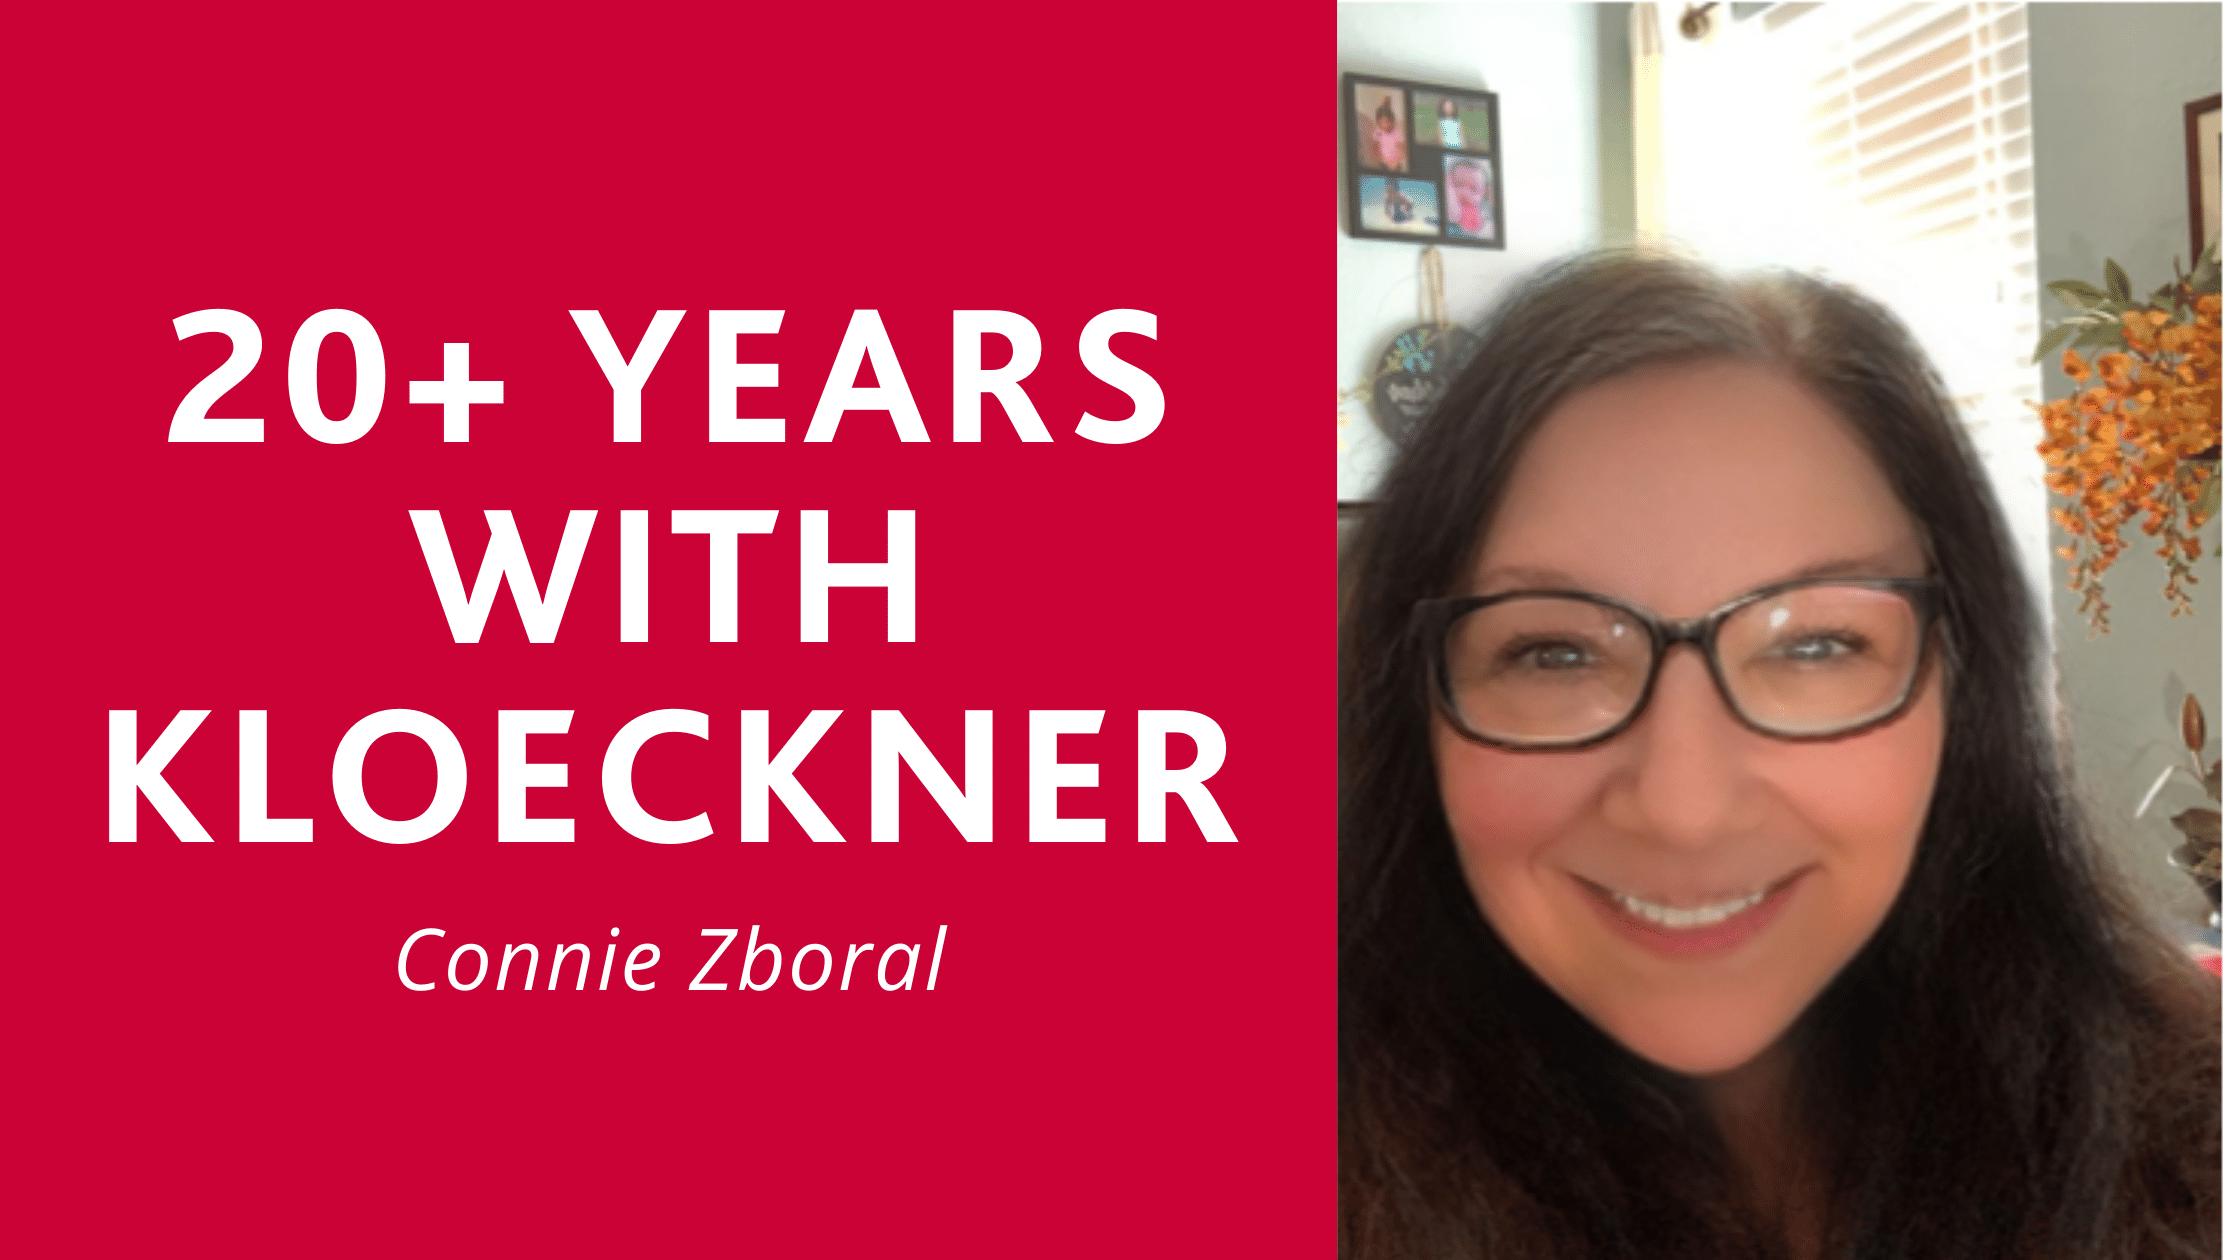 Connie Zboral 20+ Years with Kloeckner